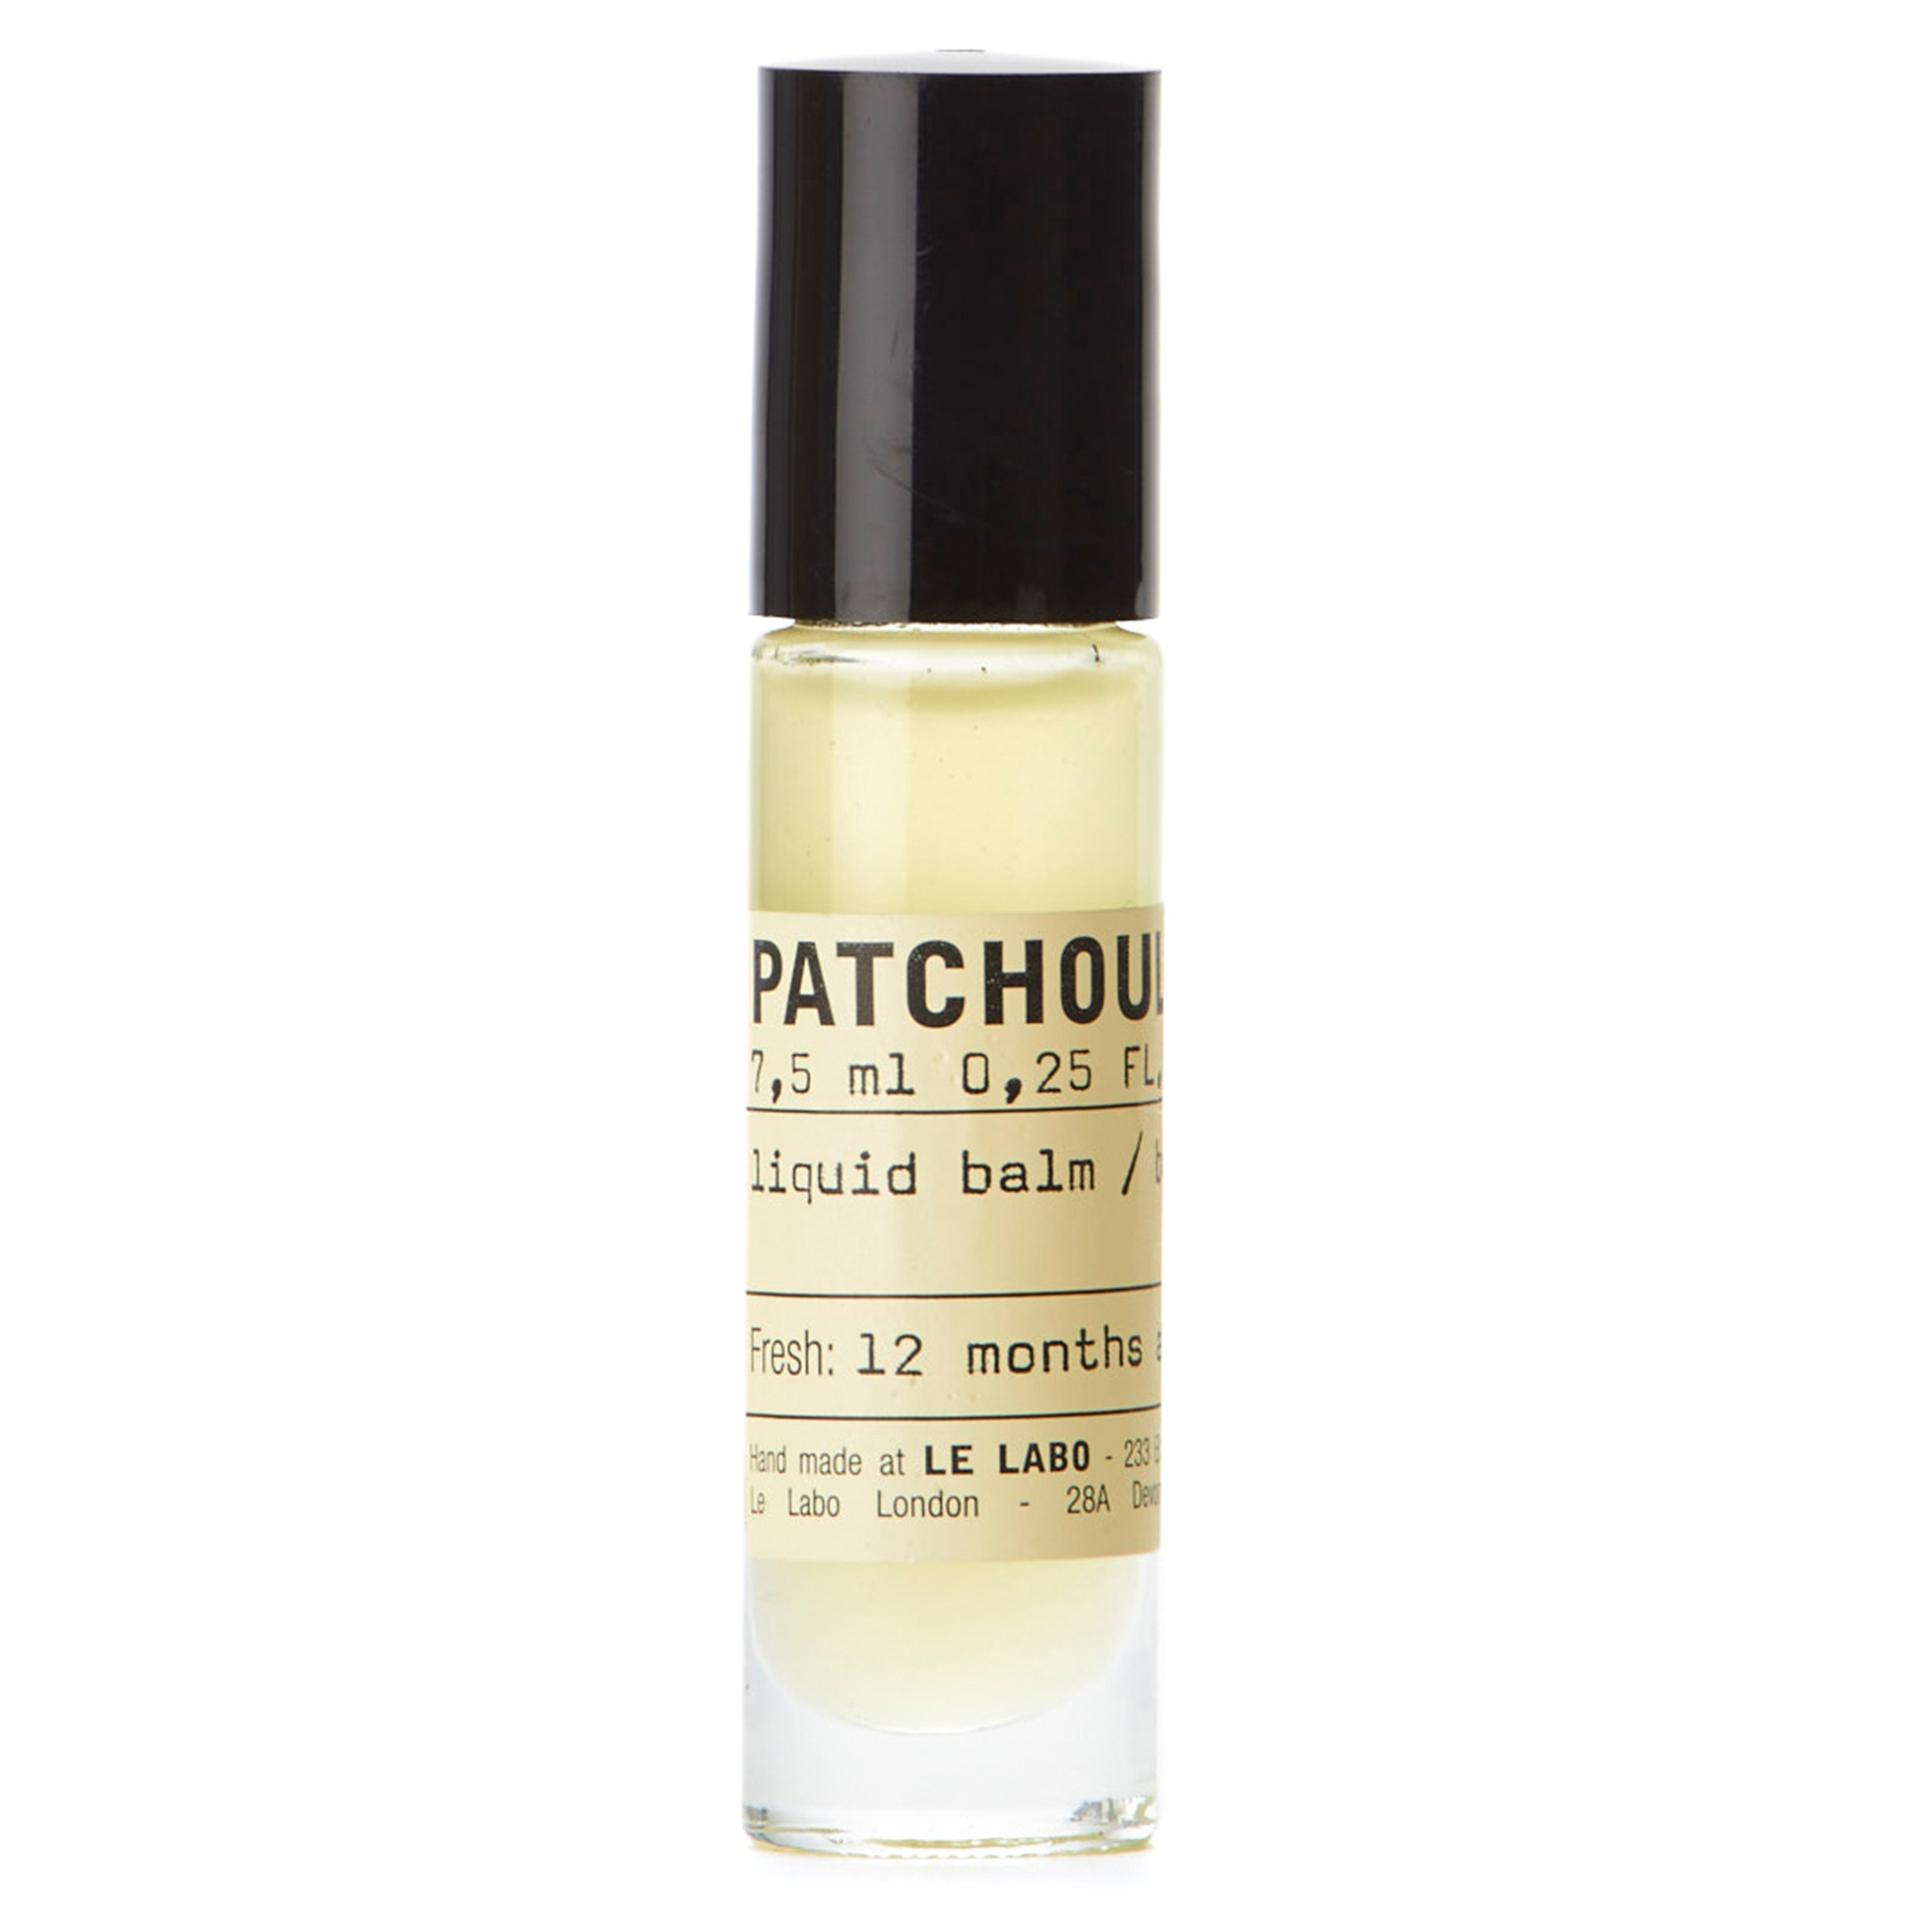 Patchouli 24 liquid balm 7.5ml